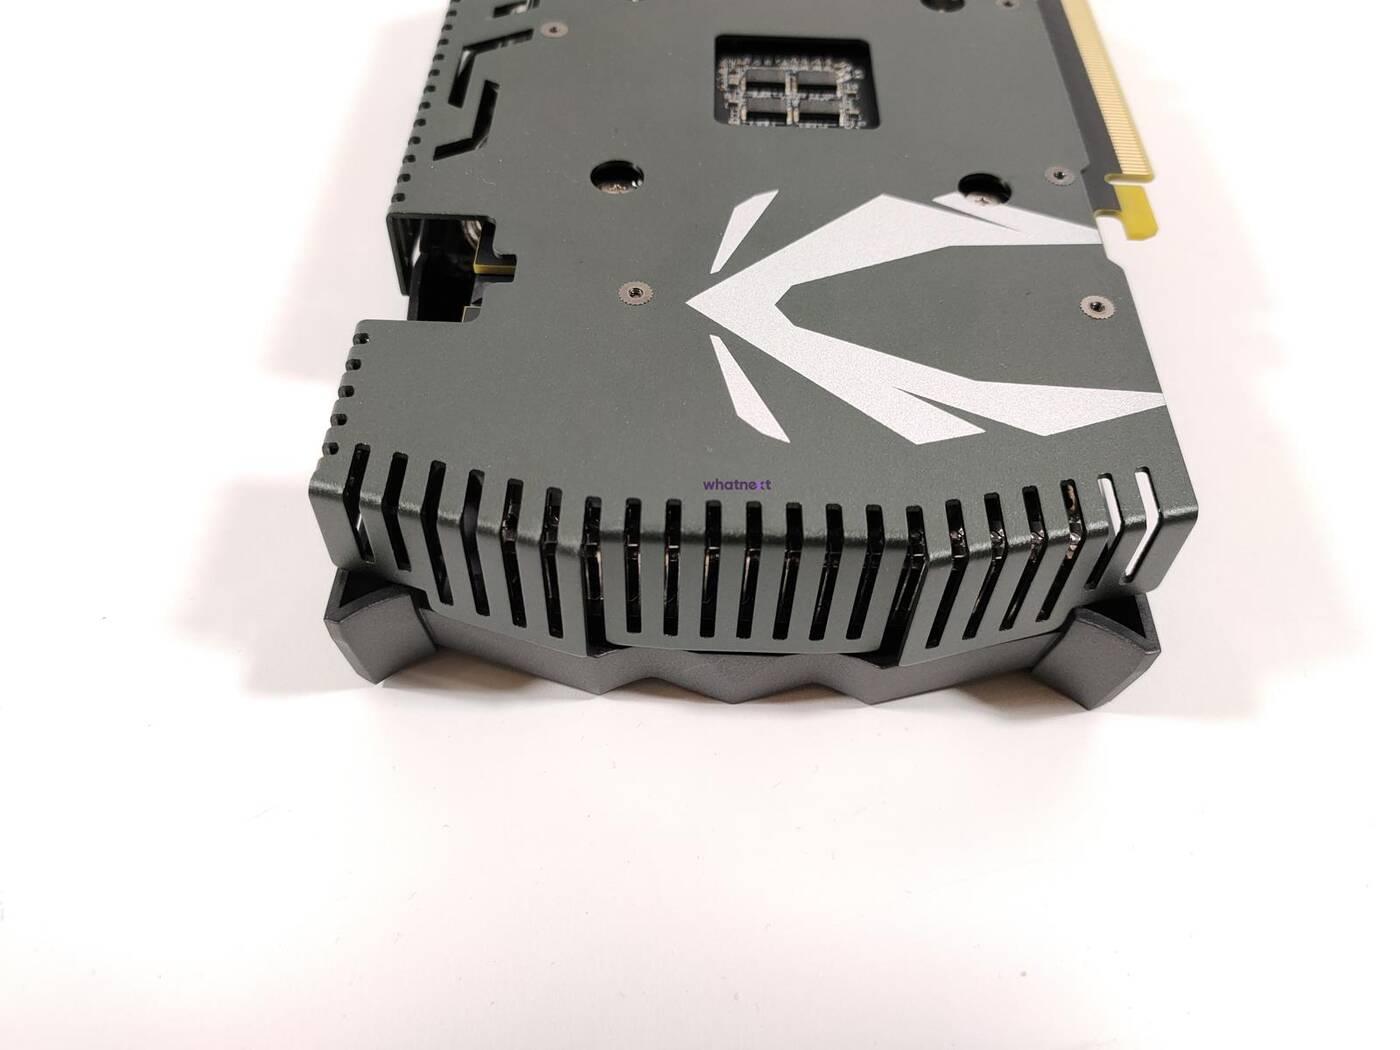 test ZOTAC GTX 1660 SUPER AMP, recenzja ZOTAC GTX 1660 SUPER AMP, review ZOTAC GTX 1660 SUPER AMP, opinia ZOTAC GTX 1660 SUPER AMP